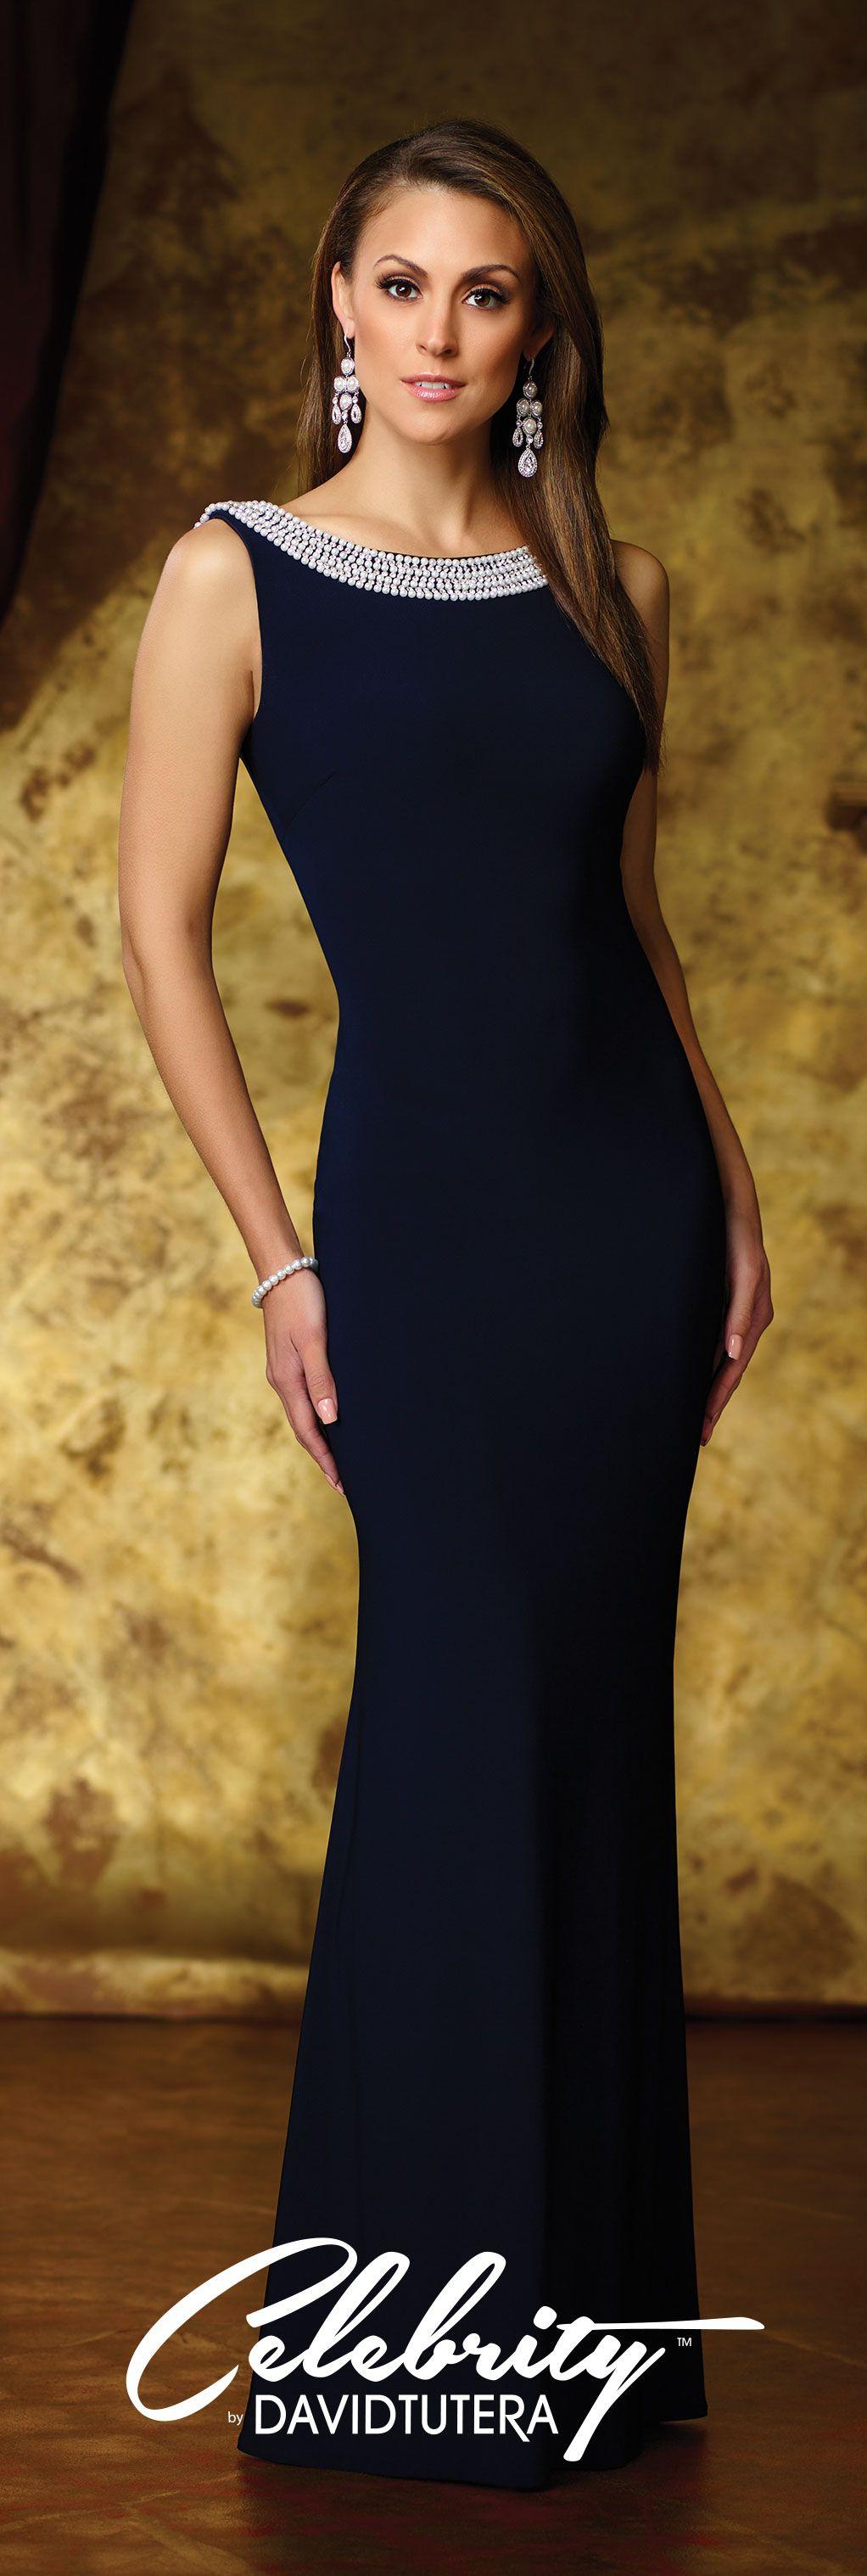 Black dresses for wedding  Wedding Guest Dresses   David tutera Celebrity and Spring